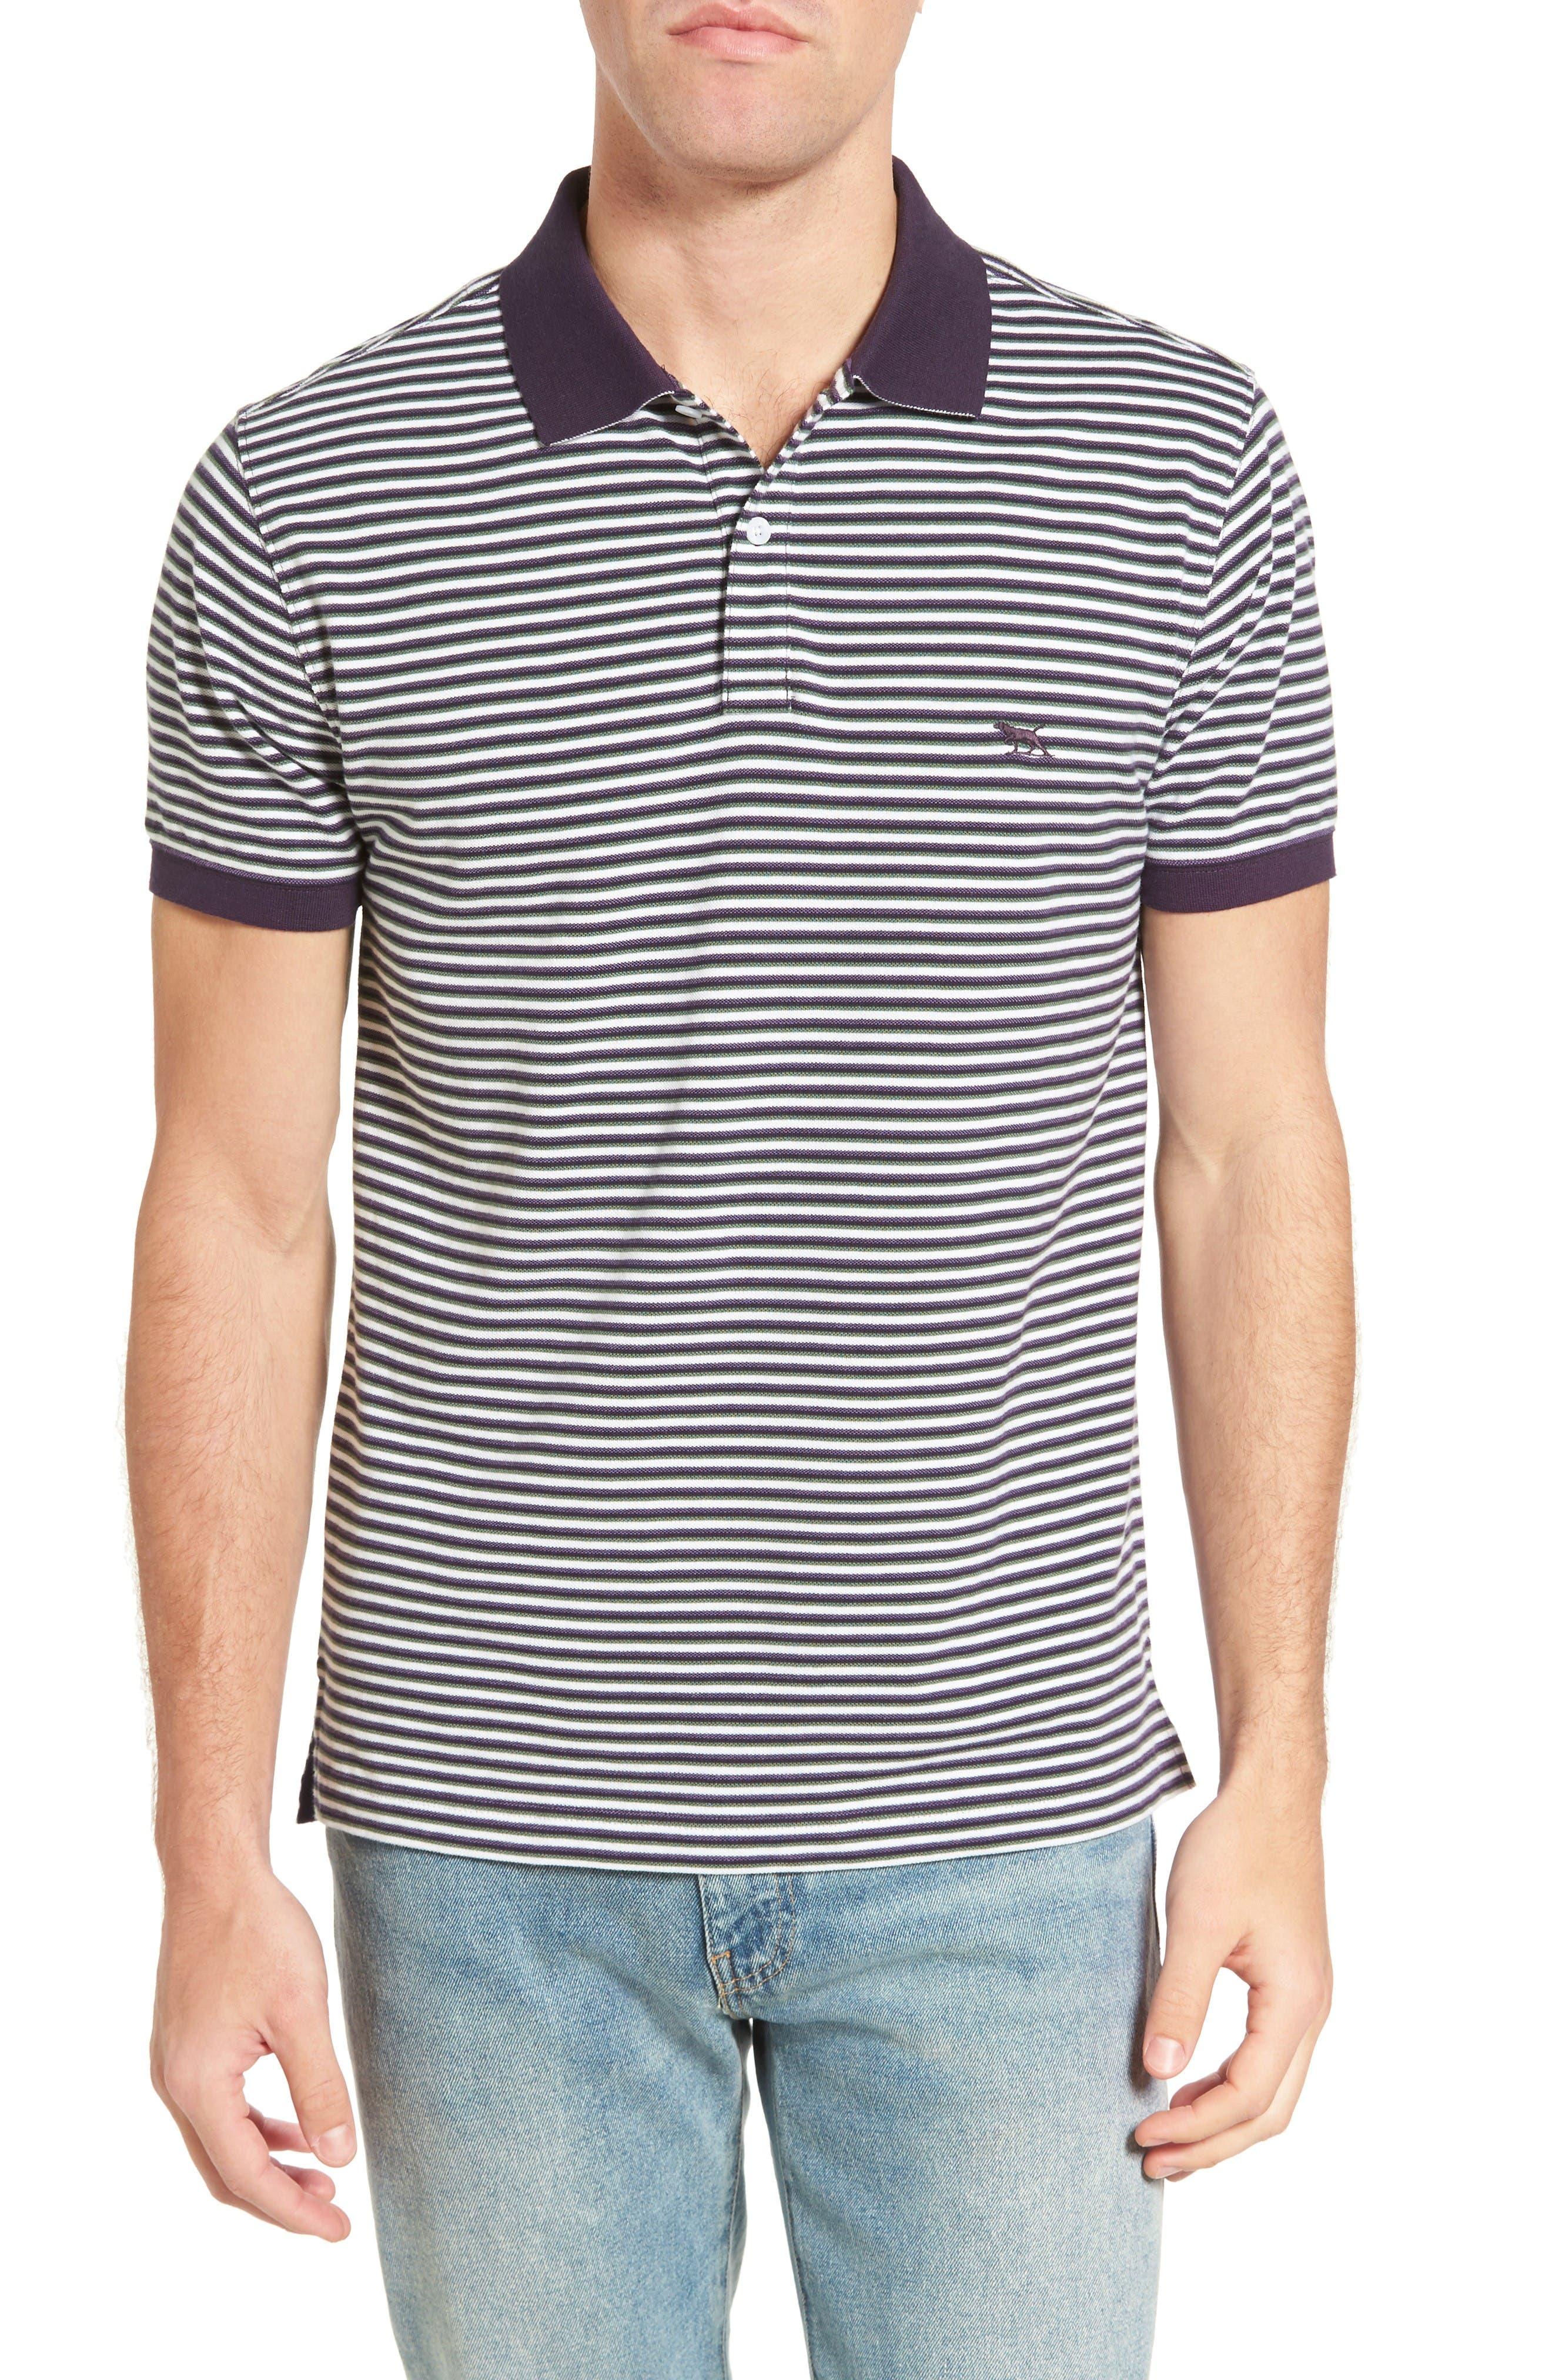 RODD & GUNN Swyers Point Sports Fit Stripe Polo